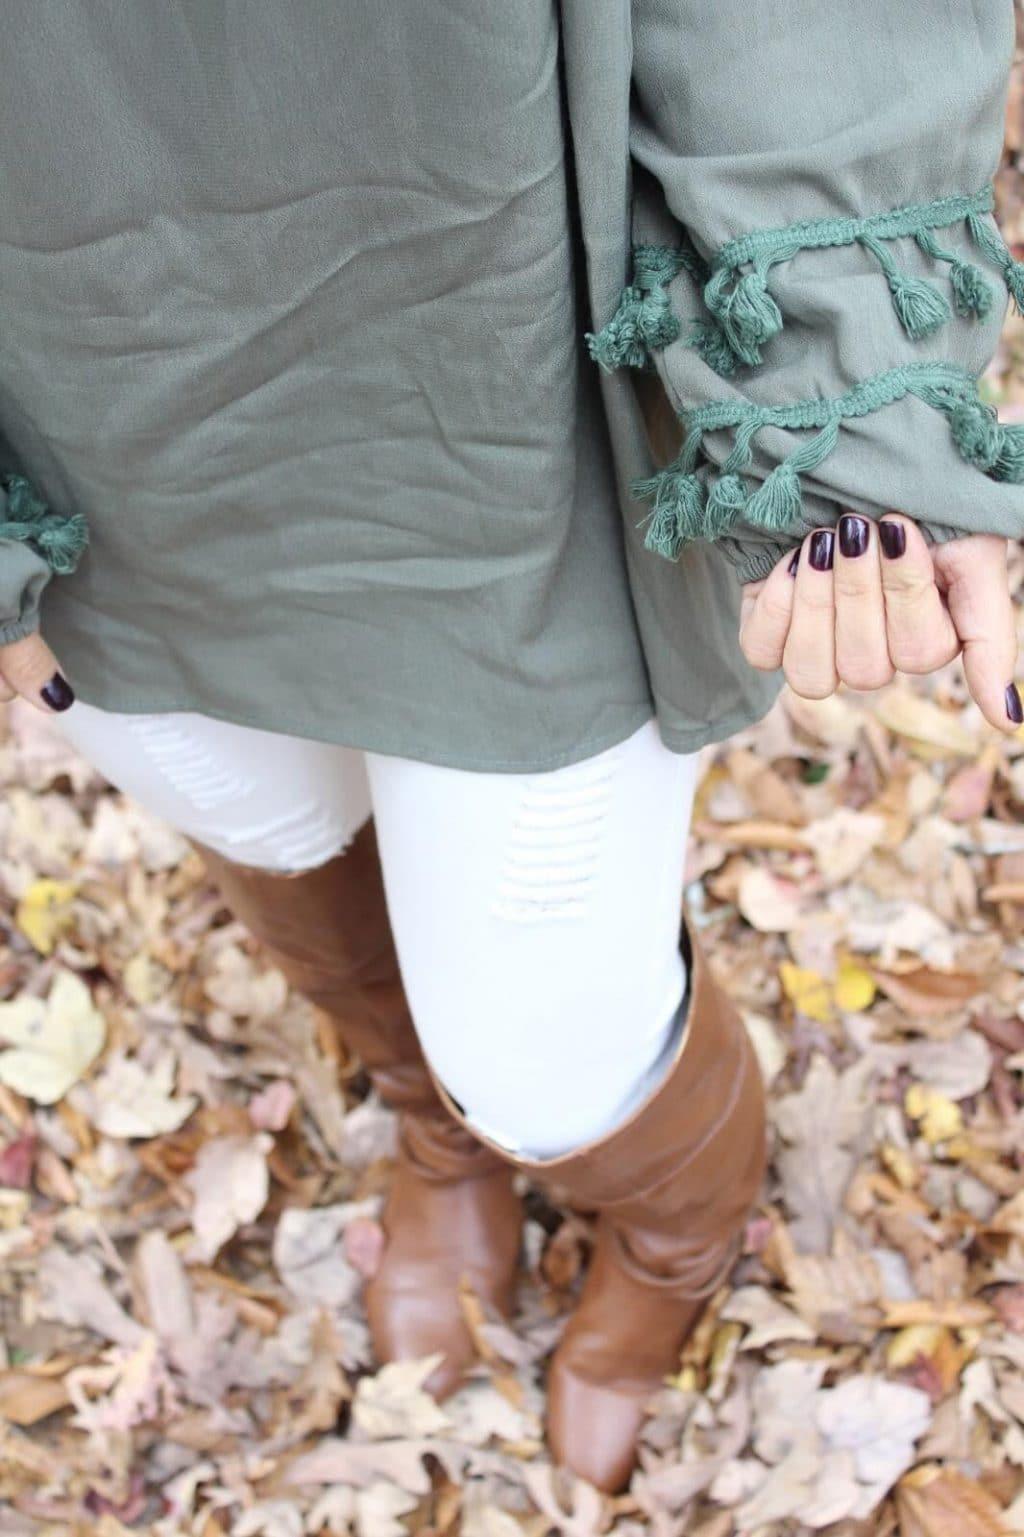 Black Cherry Nails, Tassel trim blouse, white distressed denim in fall